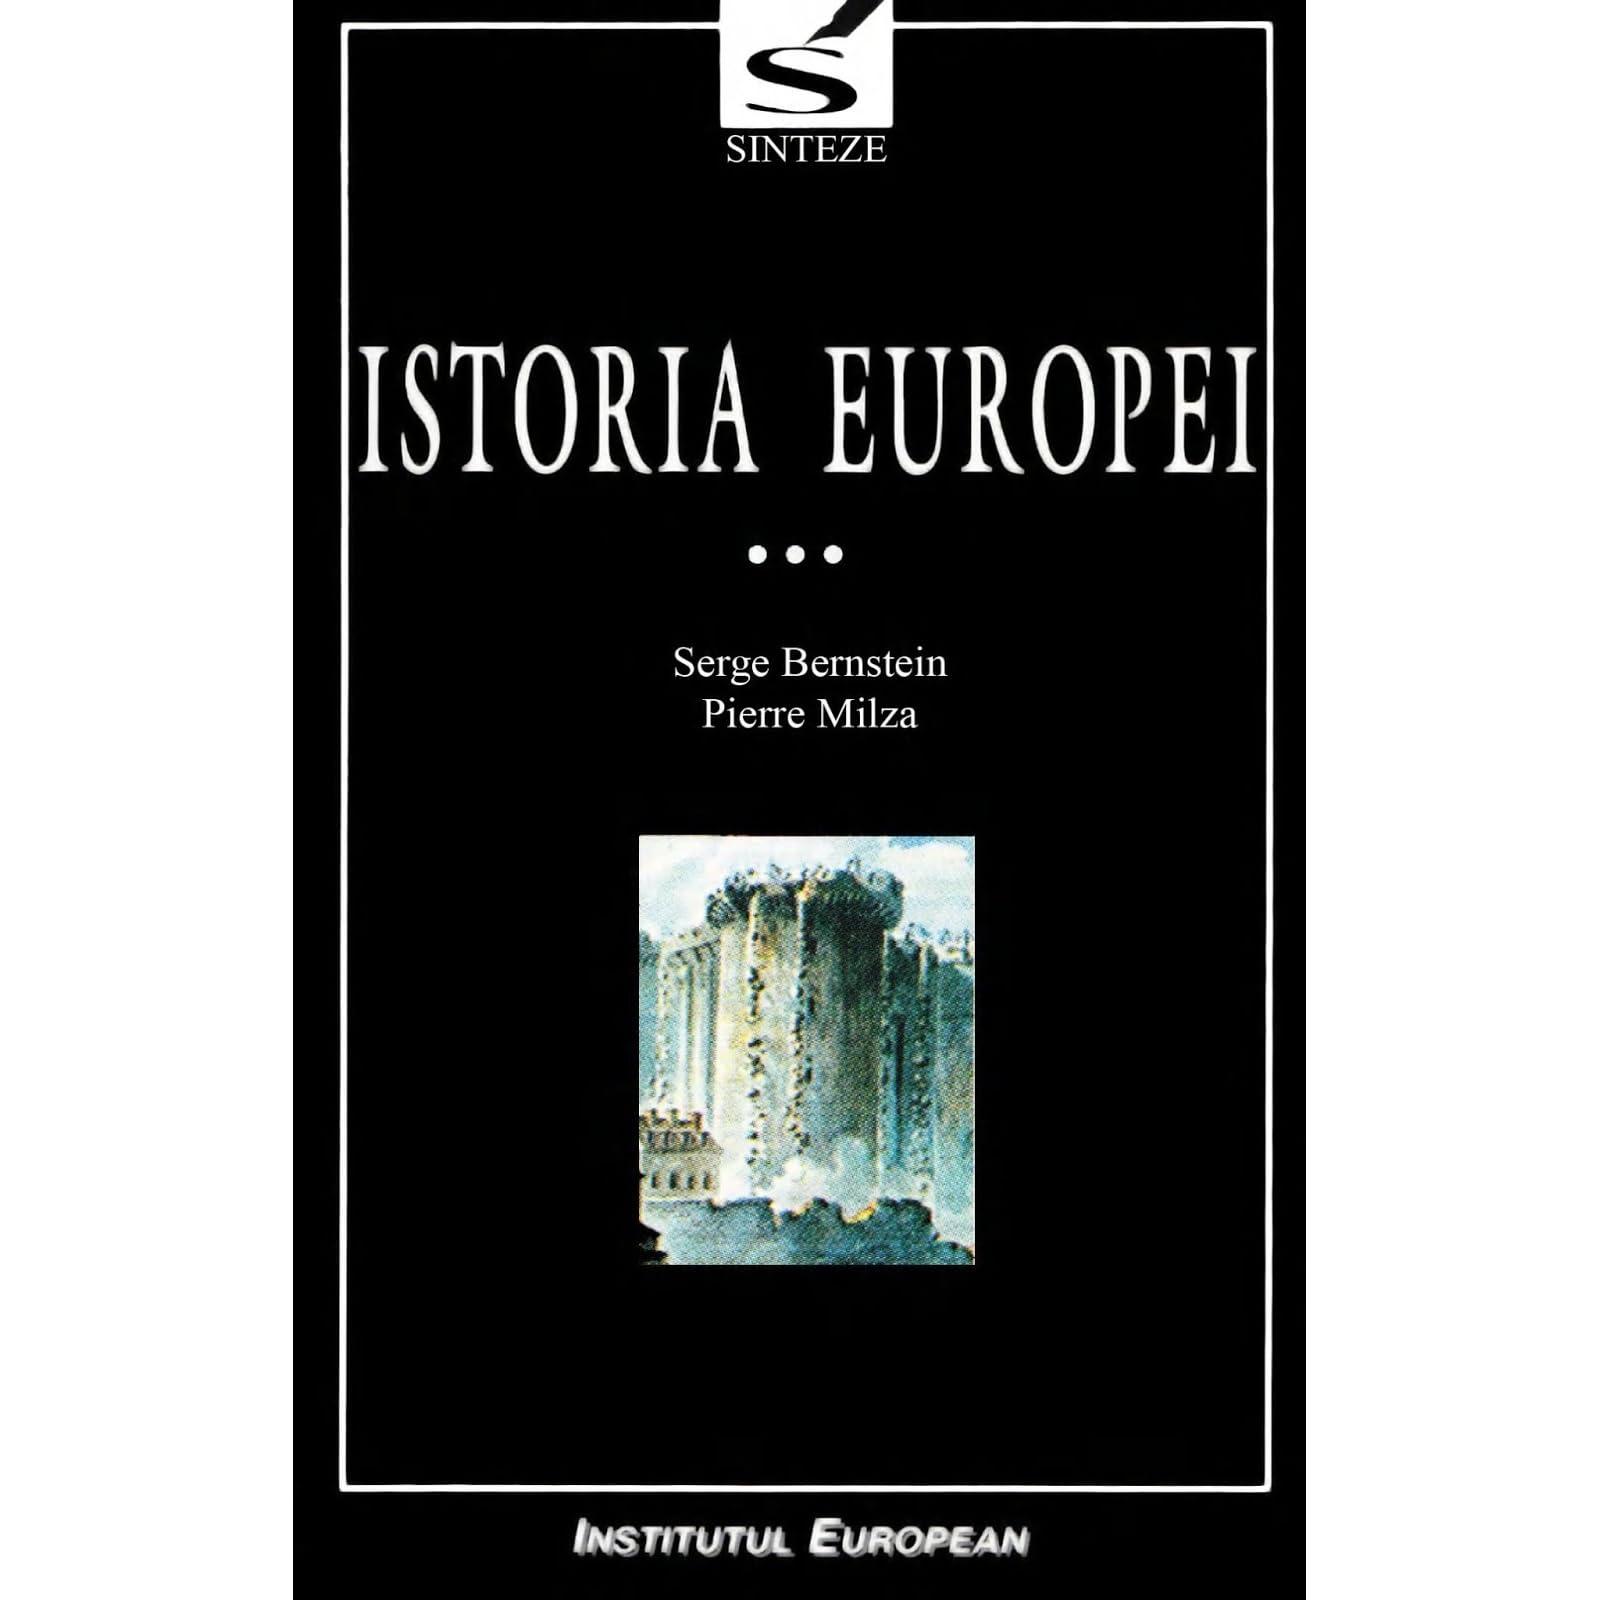 Image result for s milza istoria europei